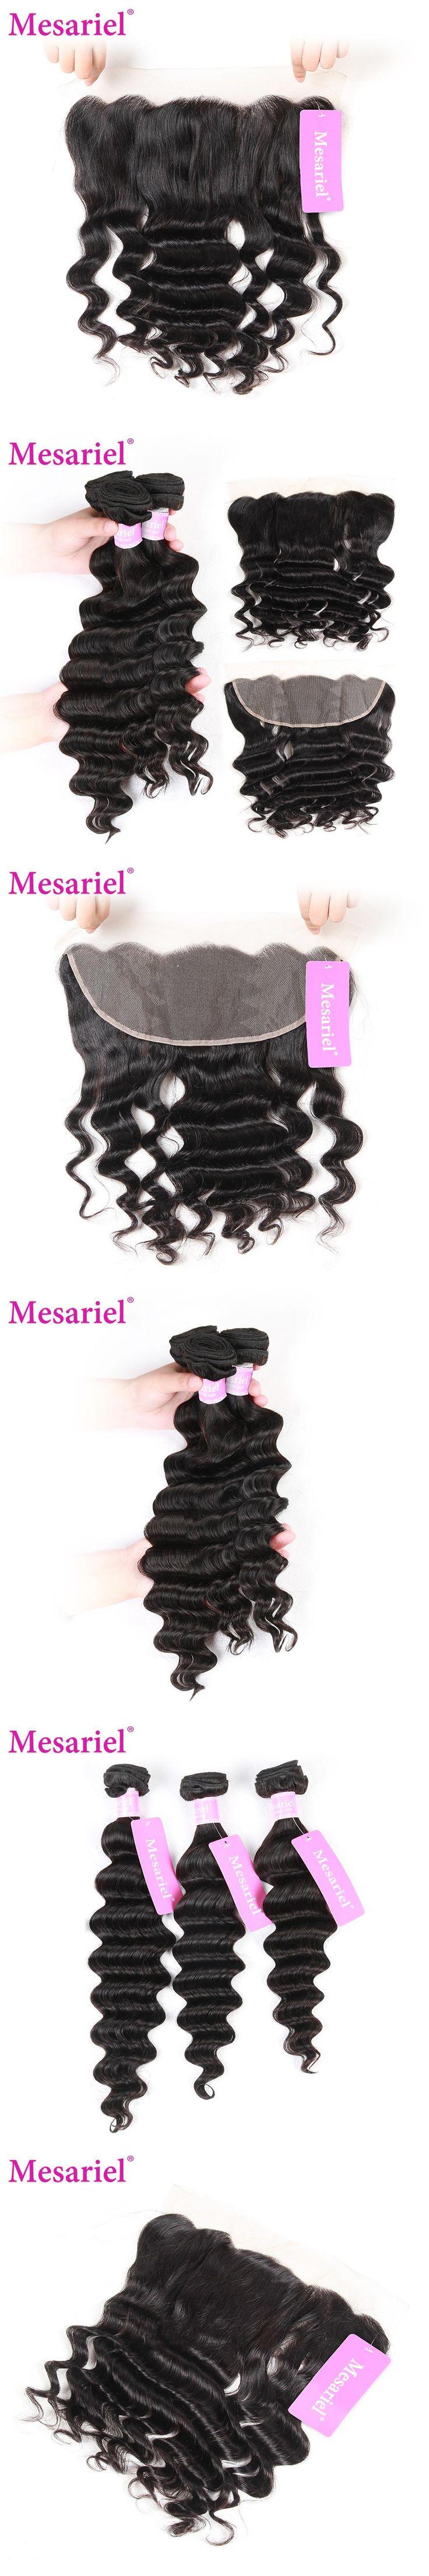 Mesariel 3 Bundles Loose Wave With 13x4 Lace Frontal Closure Non remy Natural Color Brazilian 100 Human Hair Weave